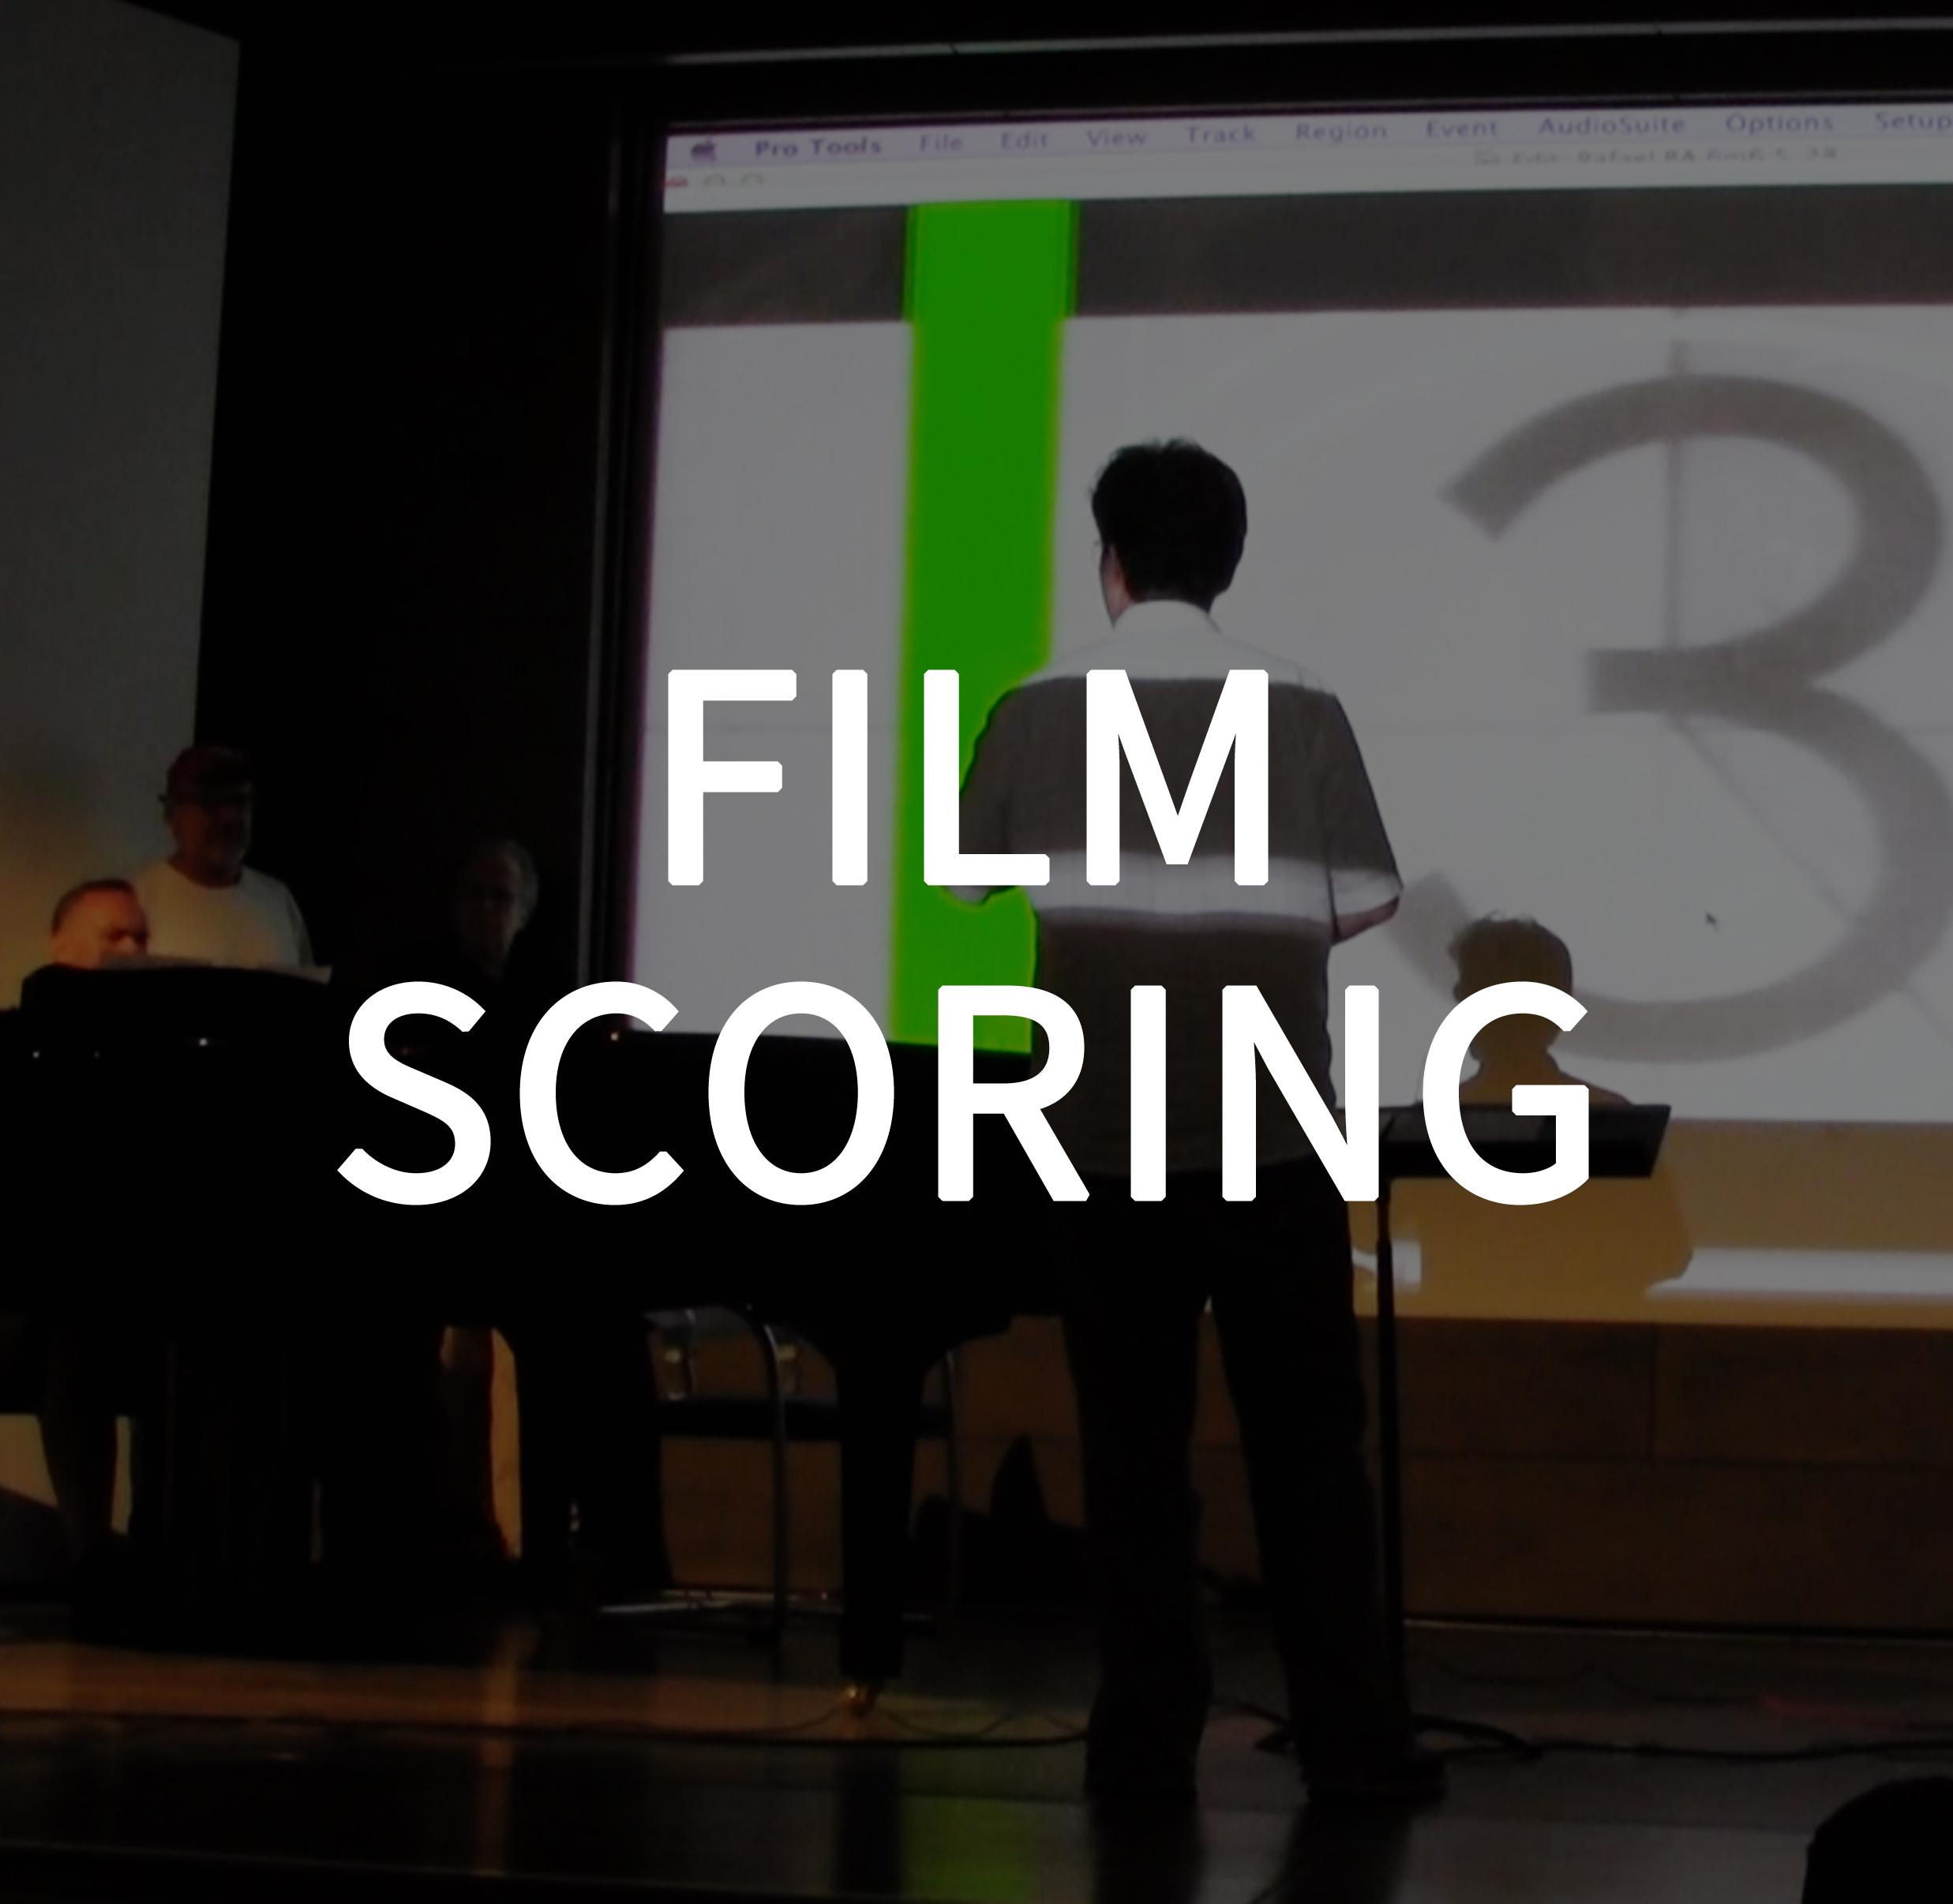 film scoring botao.jpg